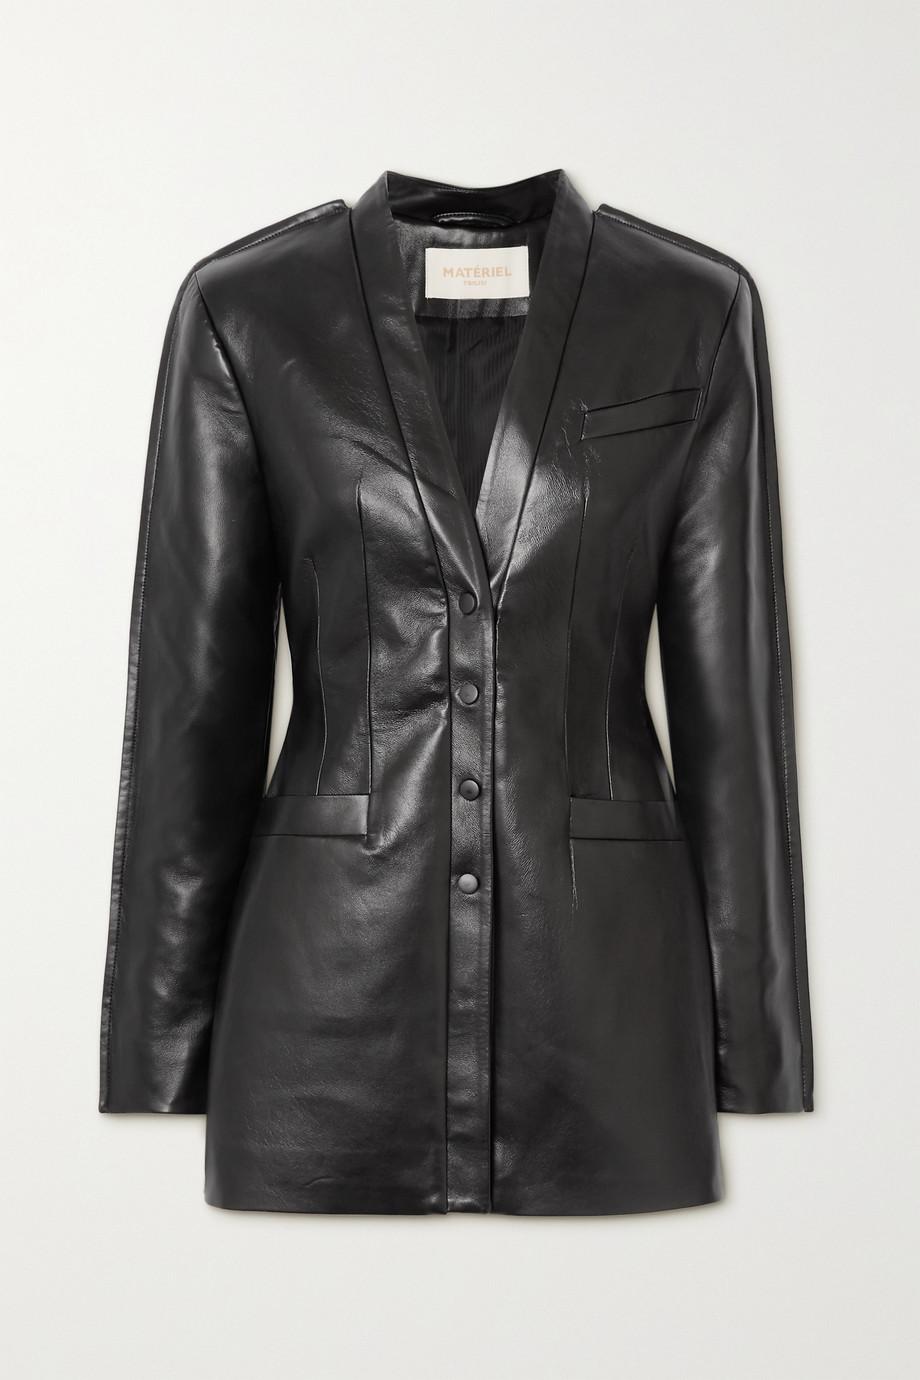 MATERIEL Mini-robe en cuir synthétique